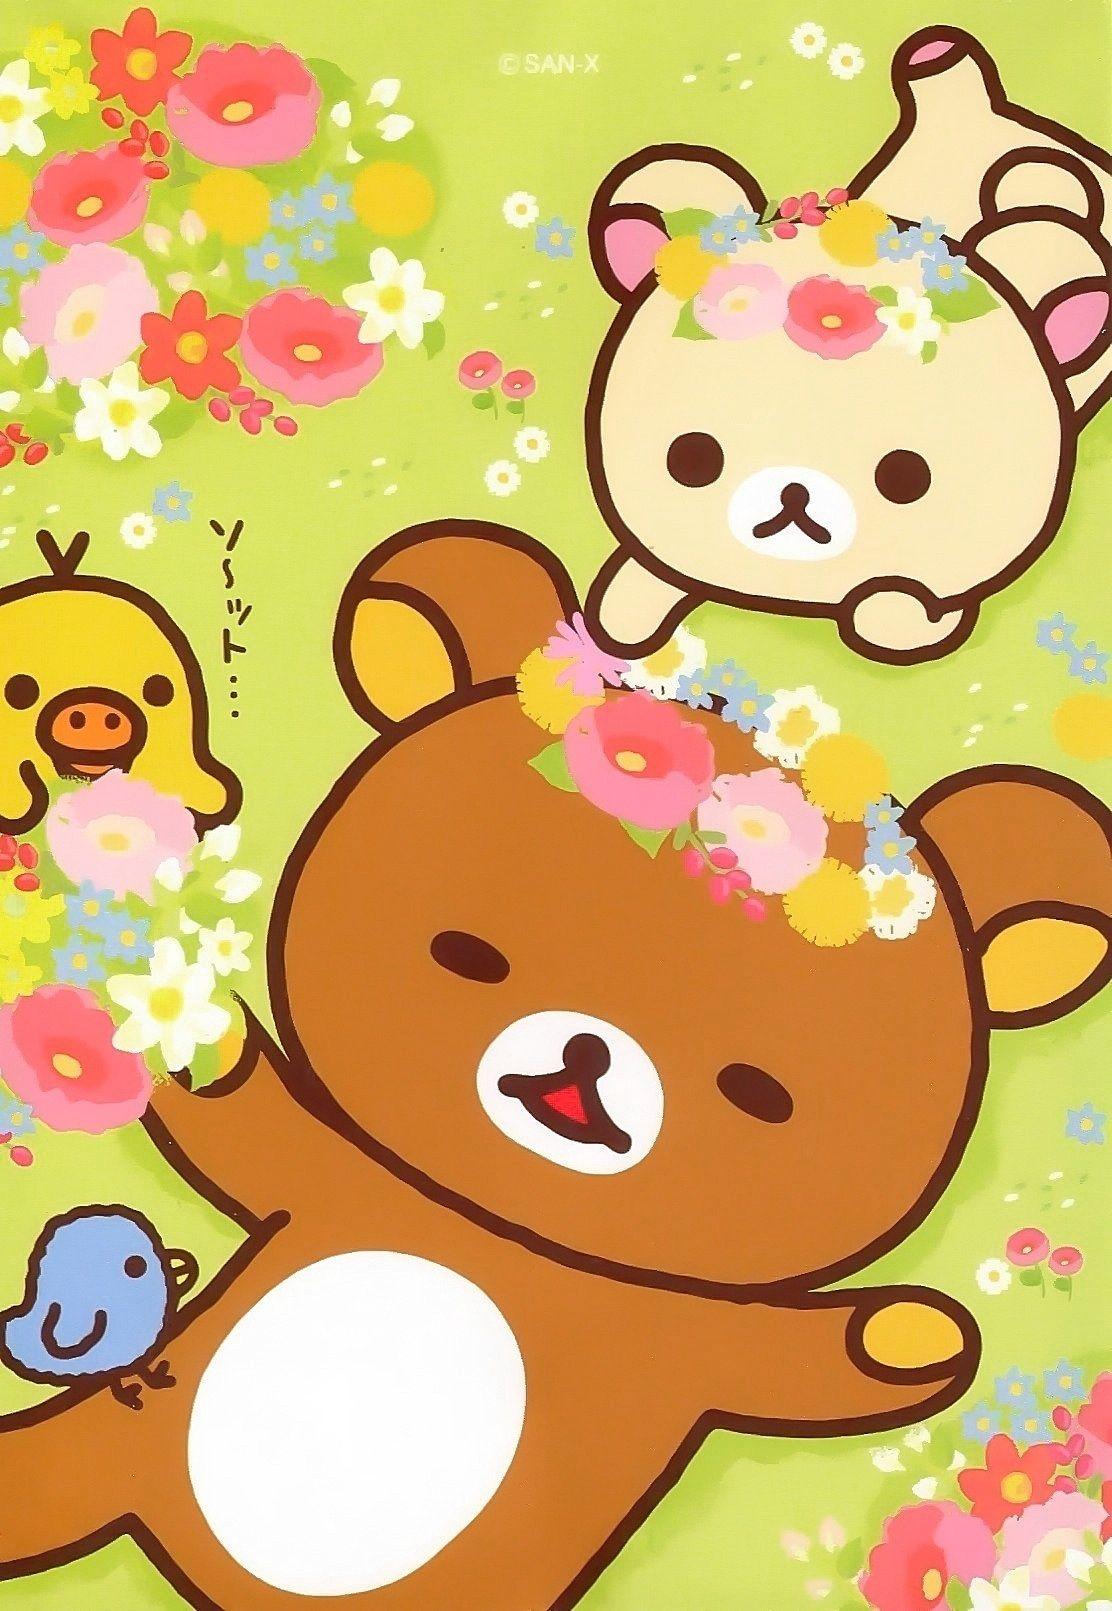 Japan & Kawaii Blippo Rilakkuma wallpaper, Rilakkuma